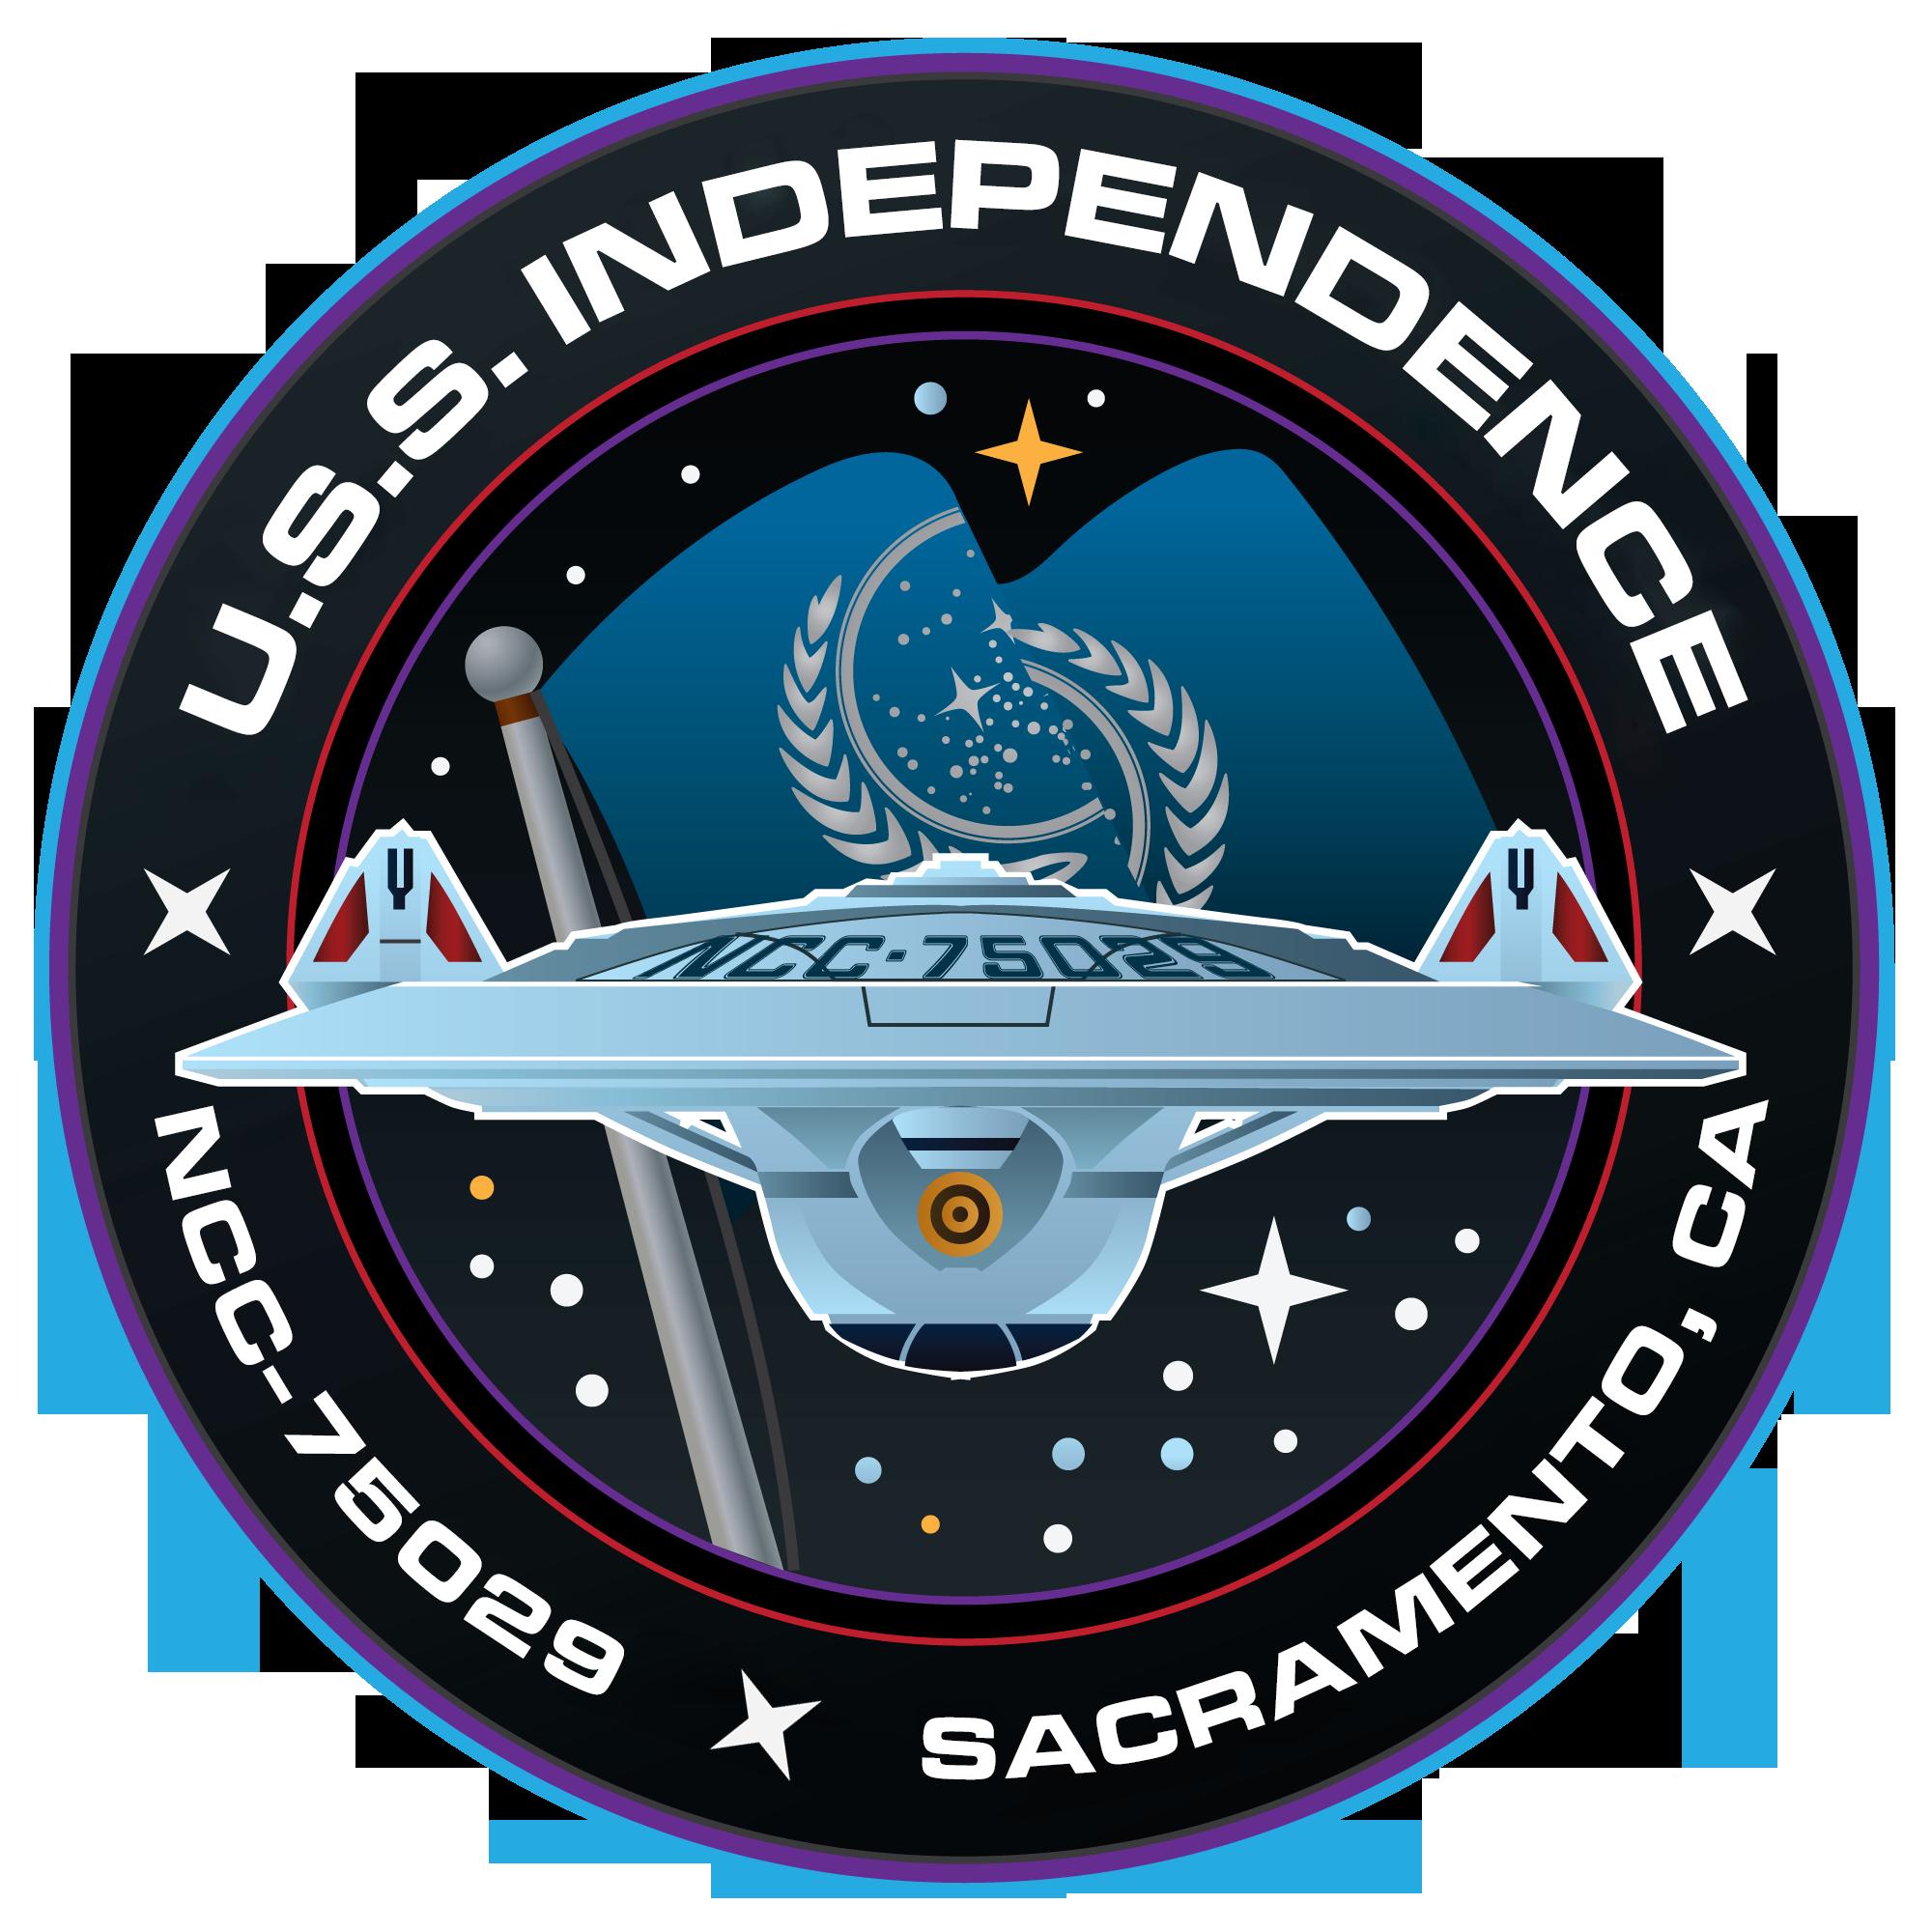 We are a group of Star Trek fans who meet on a regular basis to talk Trek, watch Trek, and create Trek. USS Independence General Meeting - November 2015